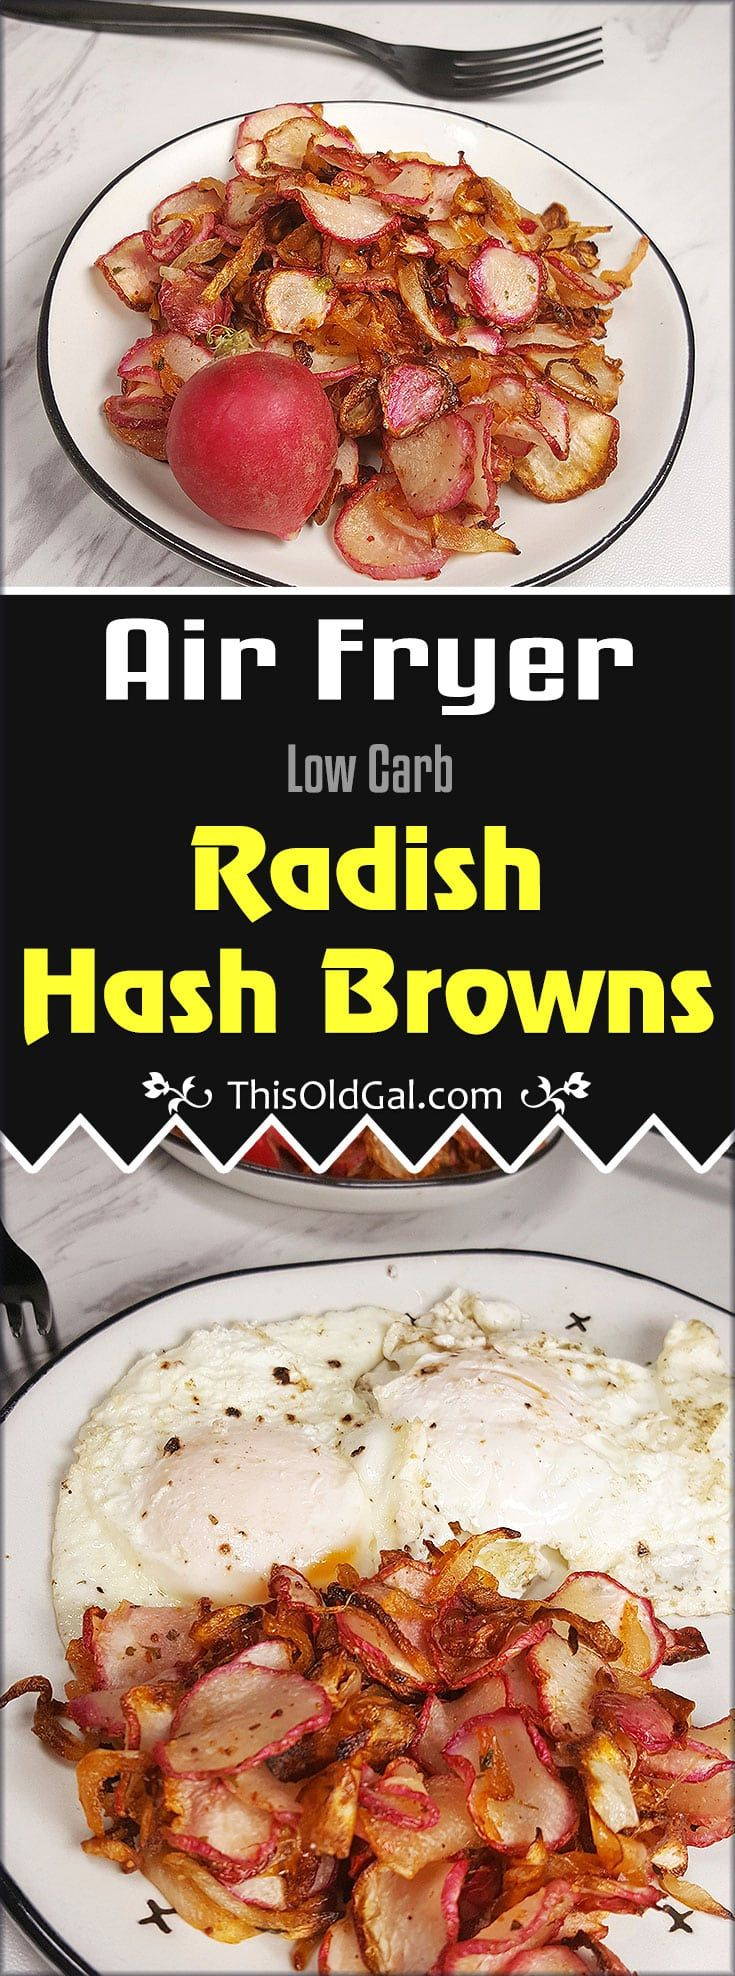 150 Best Air Fryer Recipes Air fryer recipes, Low carb